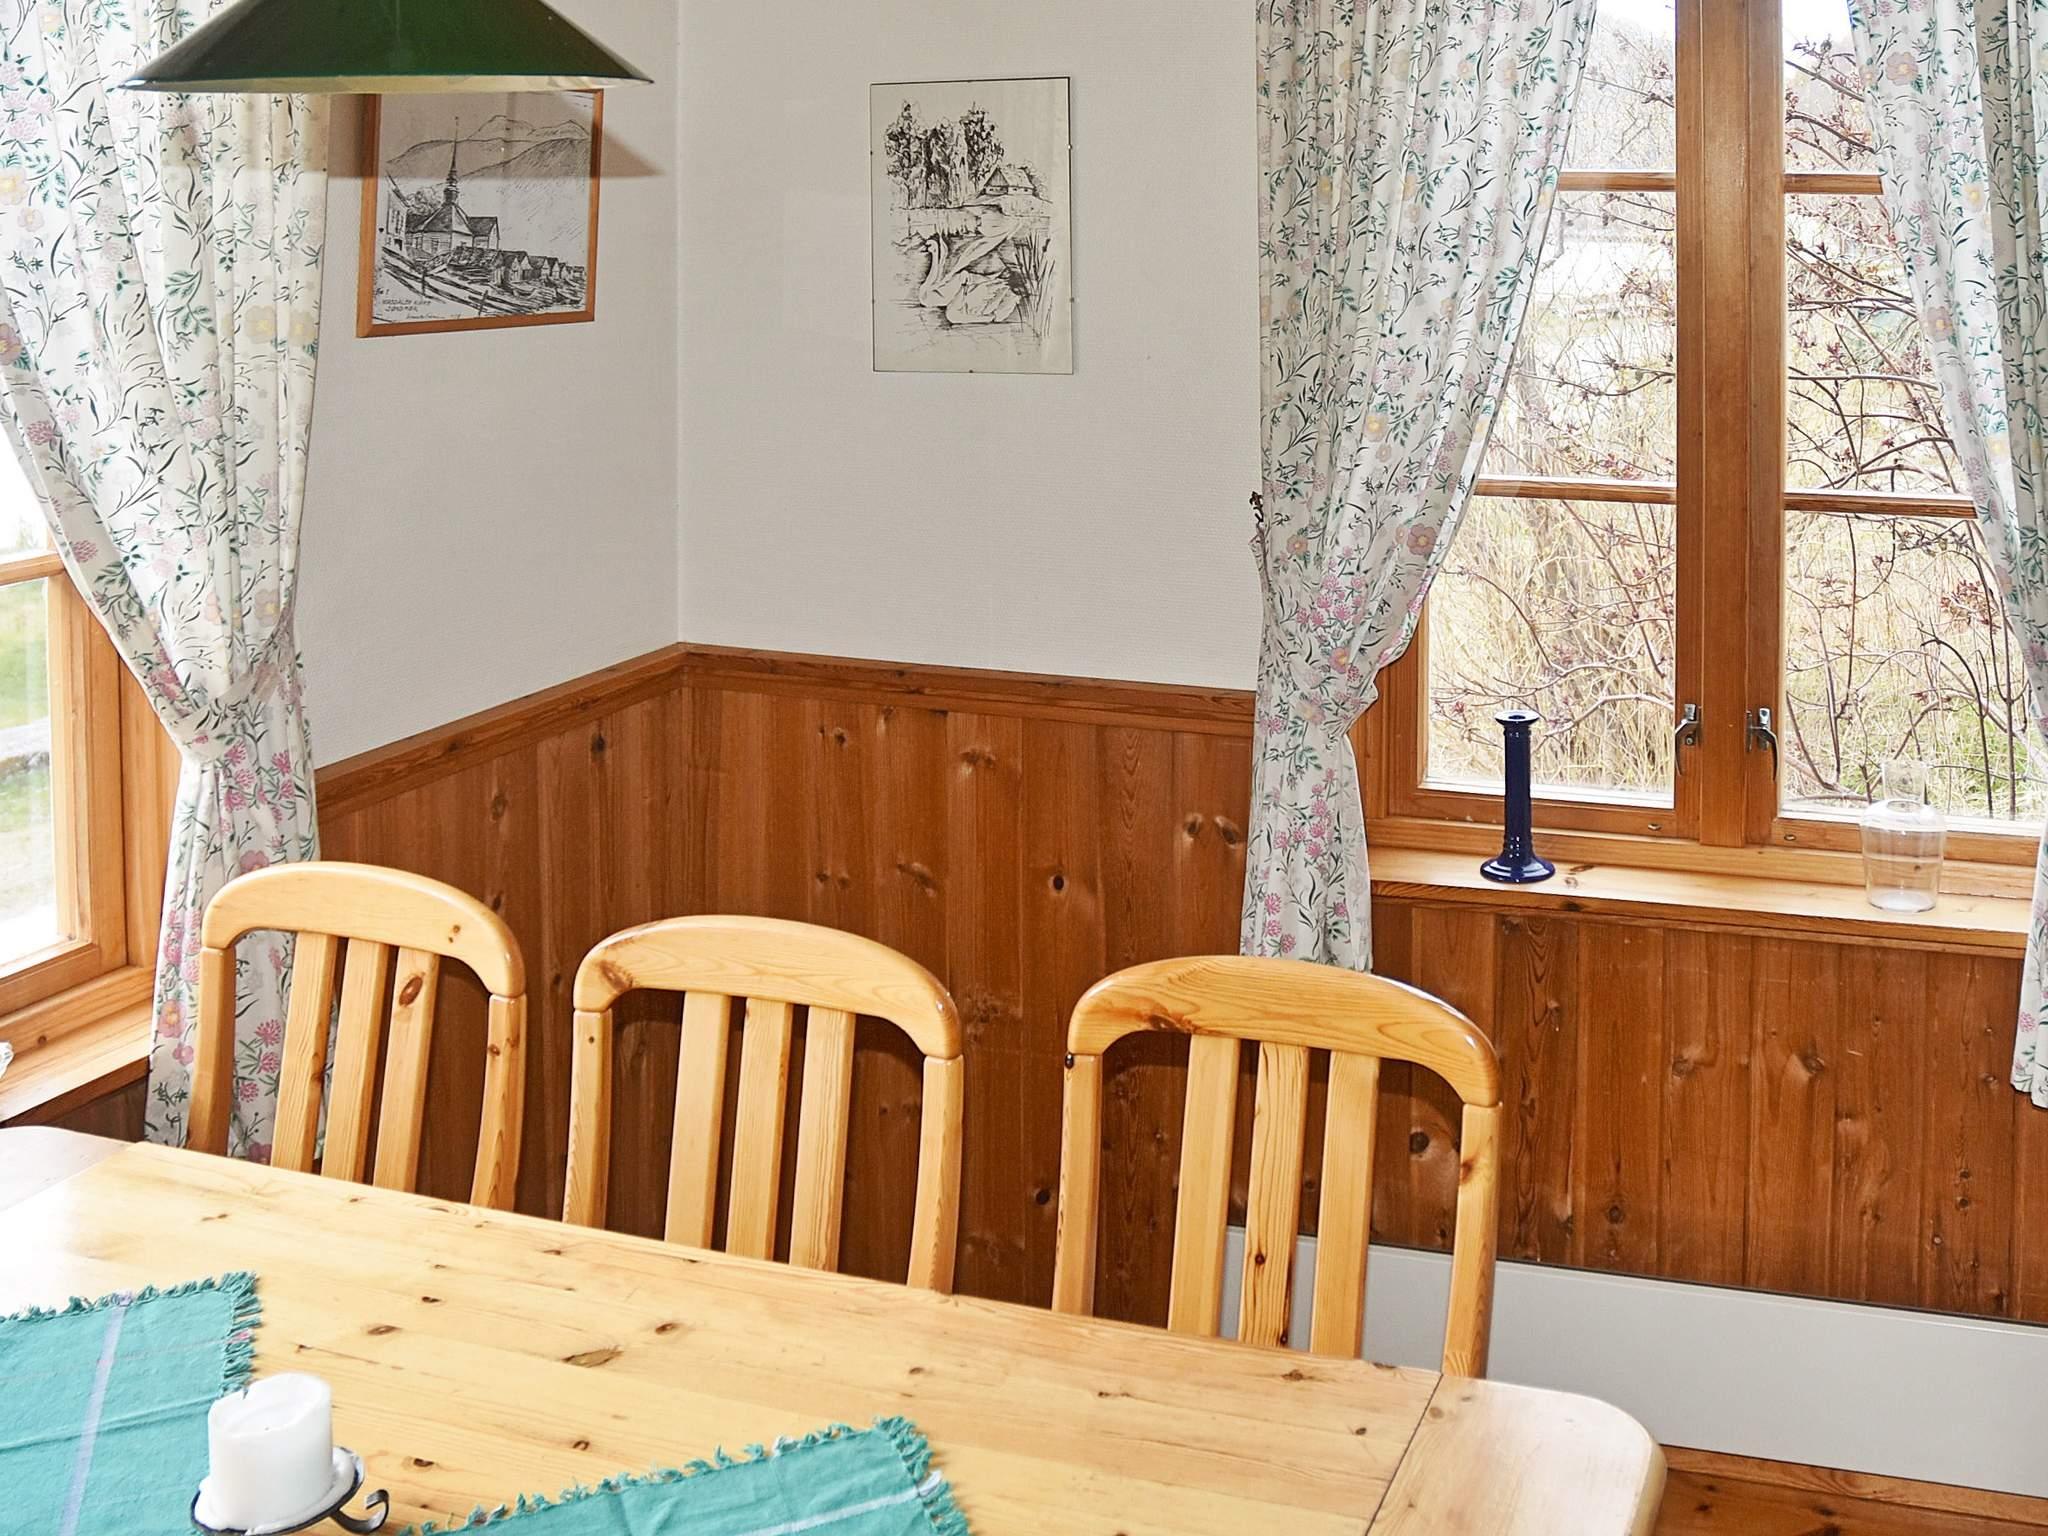 Ferienhaus Norddal (85061), Norddal, More - Romsdal, Westnorwegen, Norwegen, Bild 7